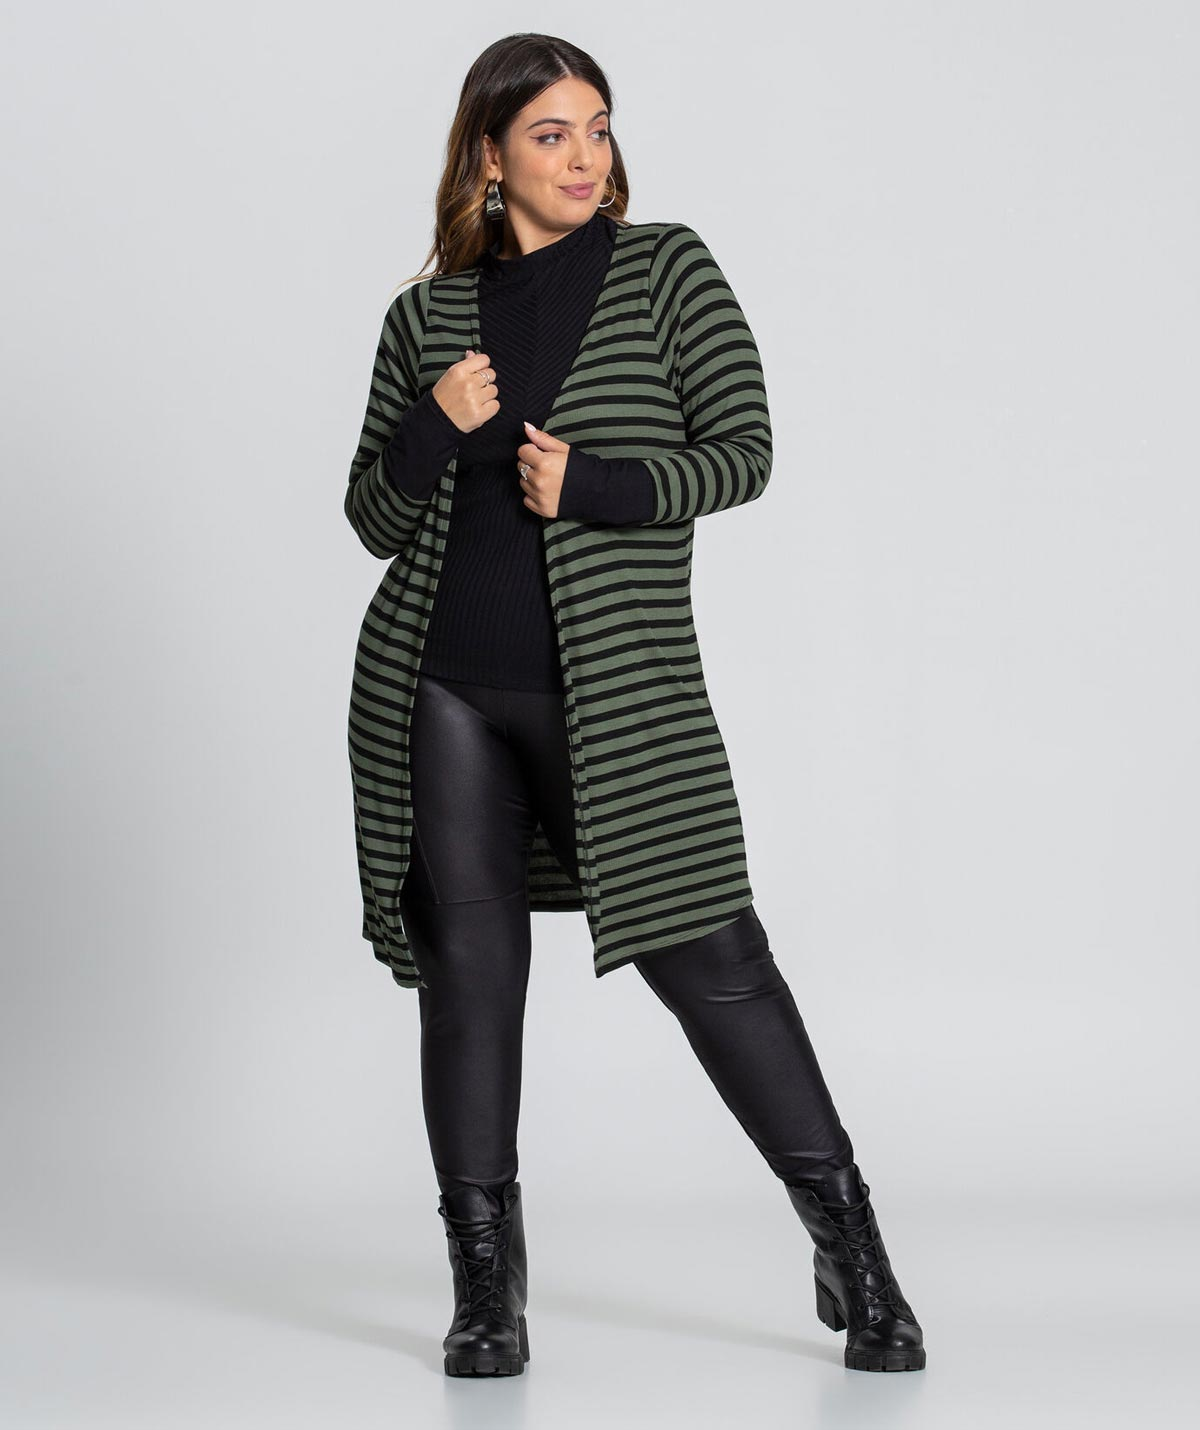 Cardigan Listrado Feminino Lunender Plus Size